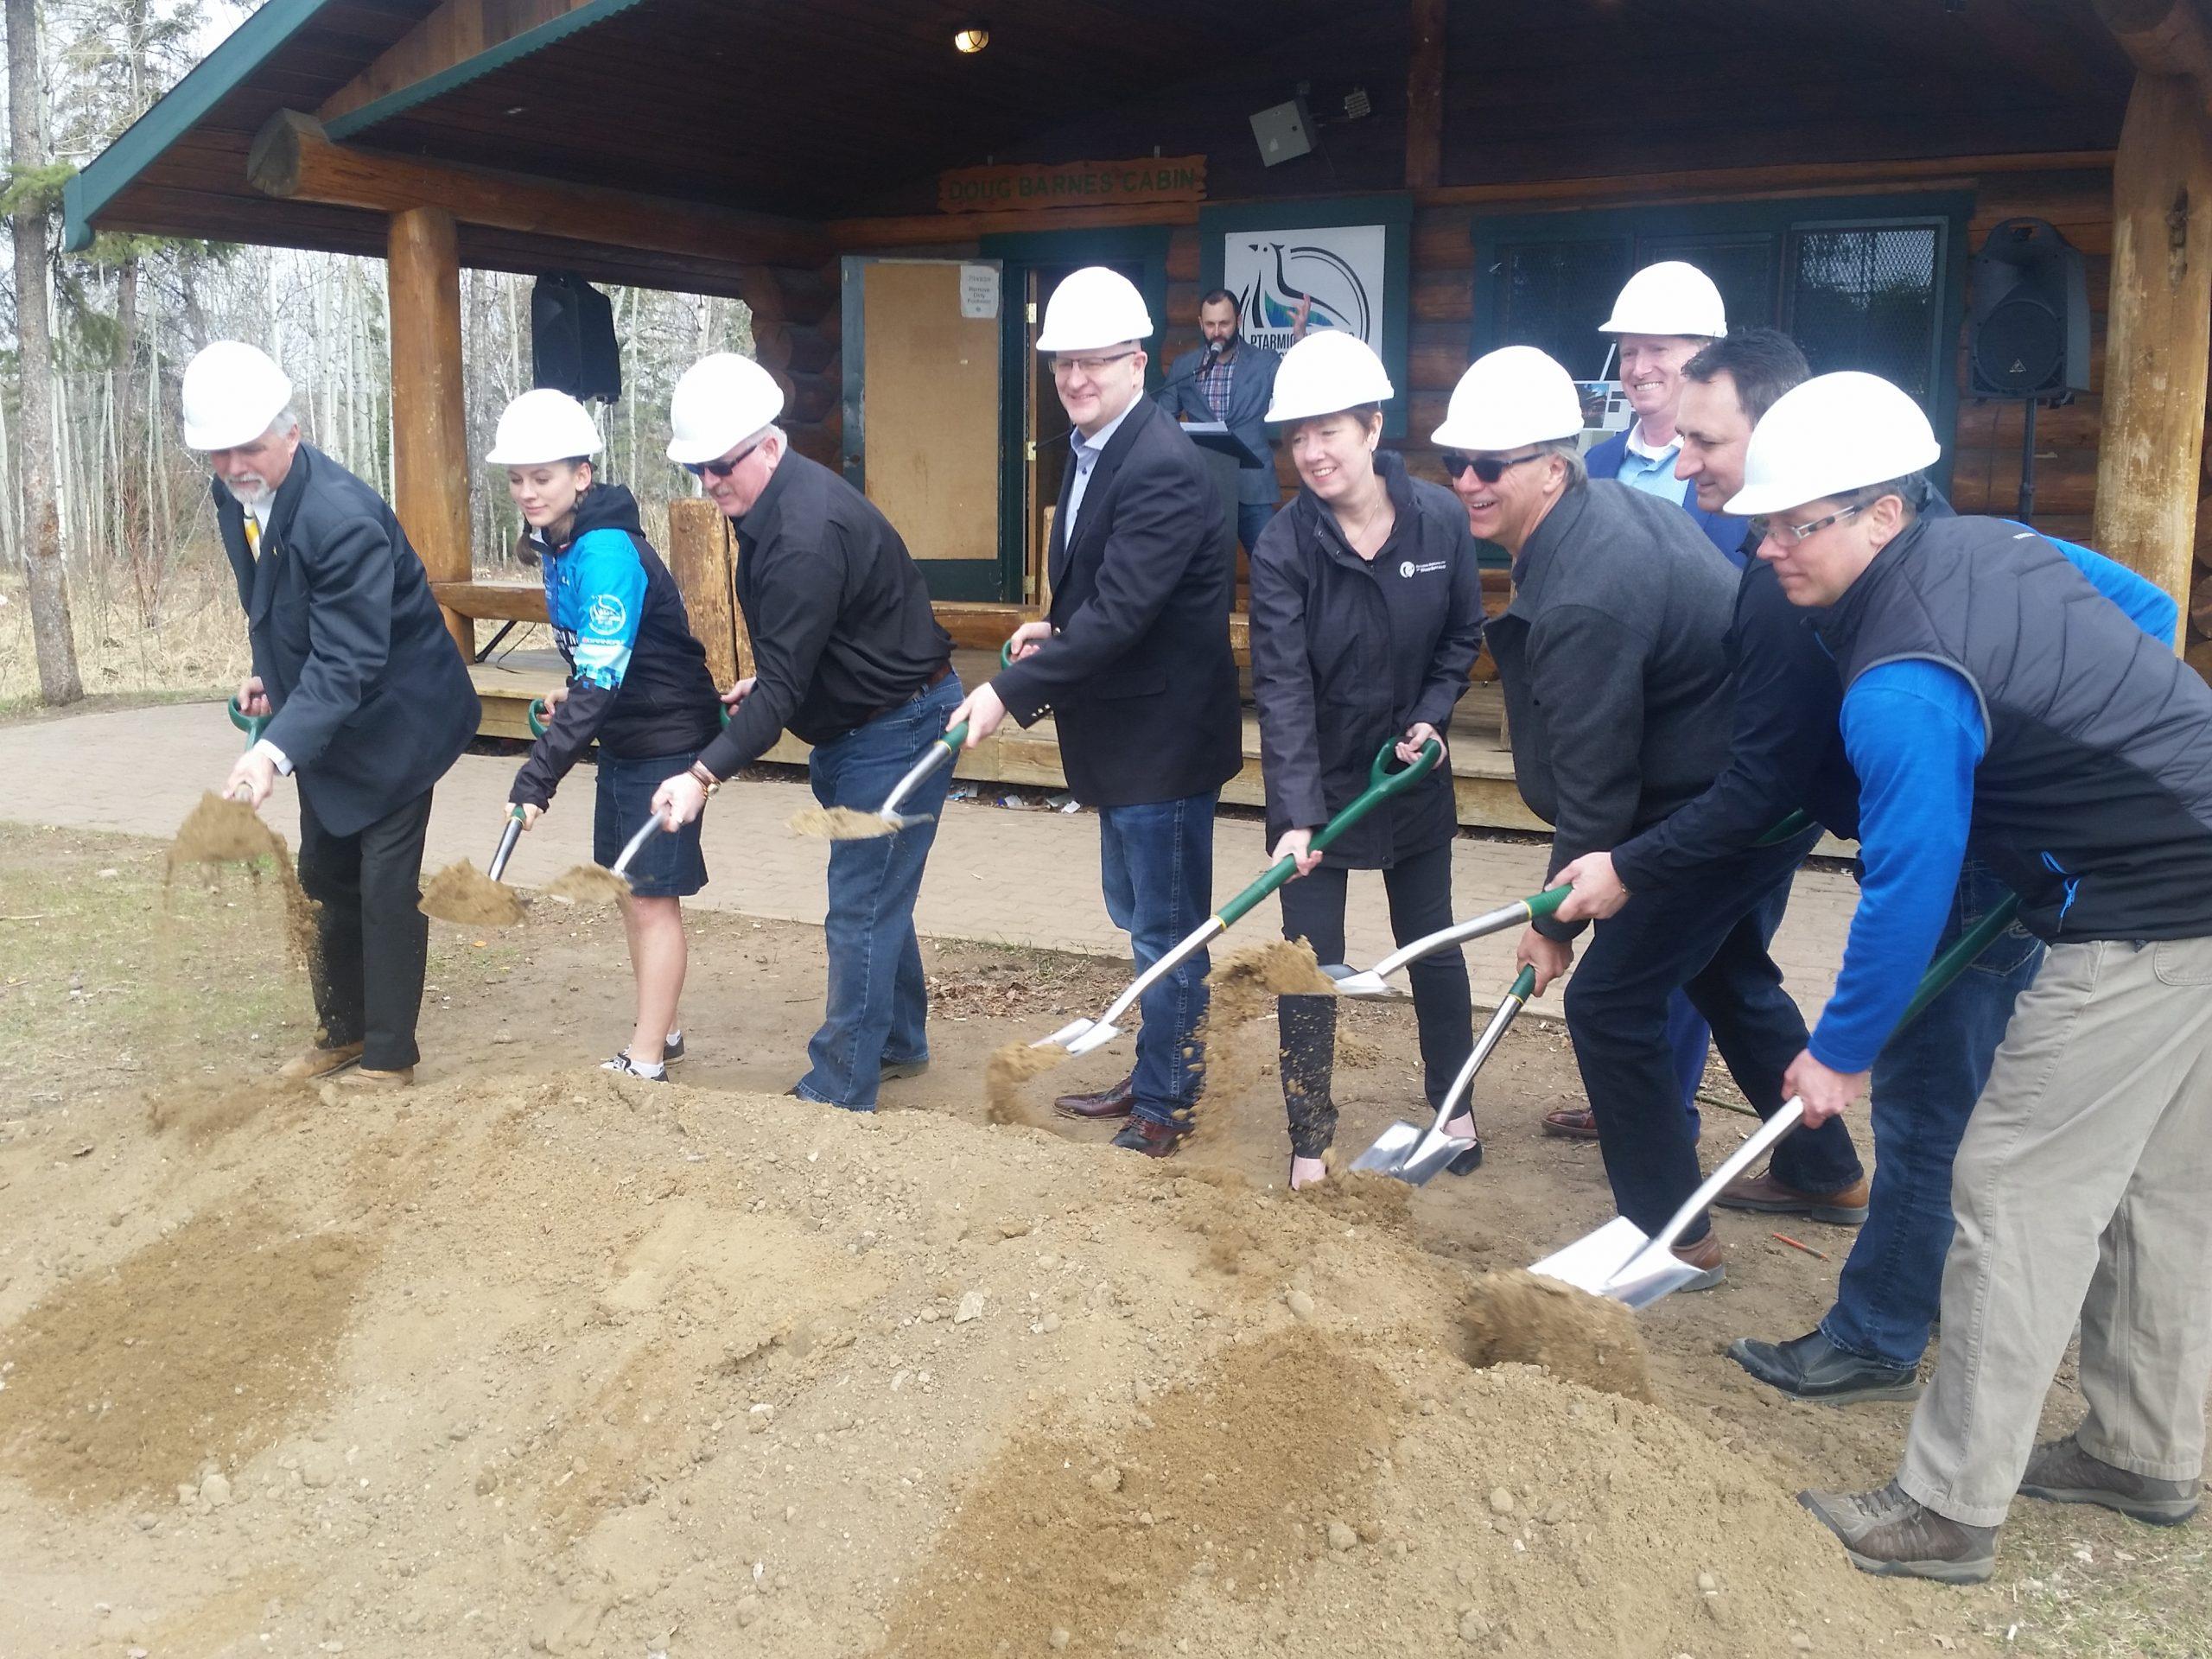 Doug Barnes Cabin Expansion Underway